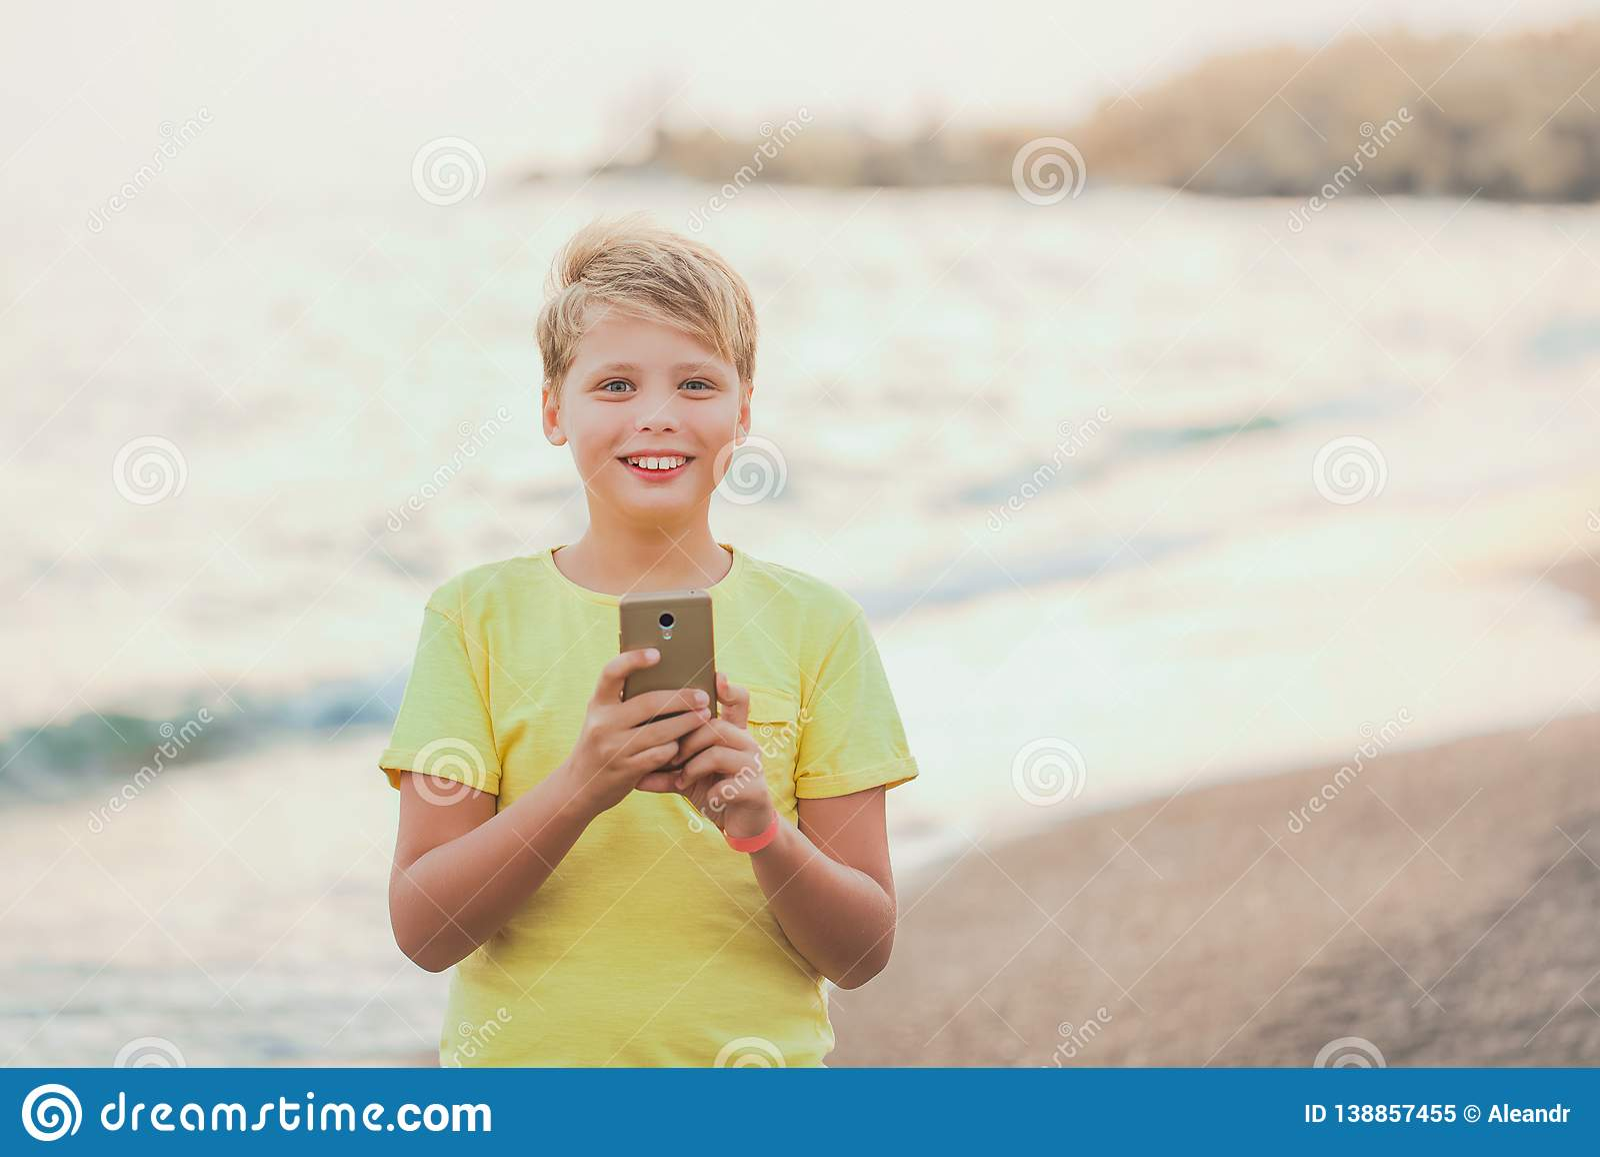 Portrait of cute happy smiling white kid using modern smart phone